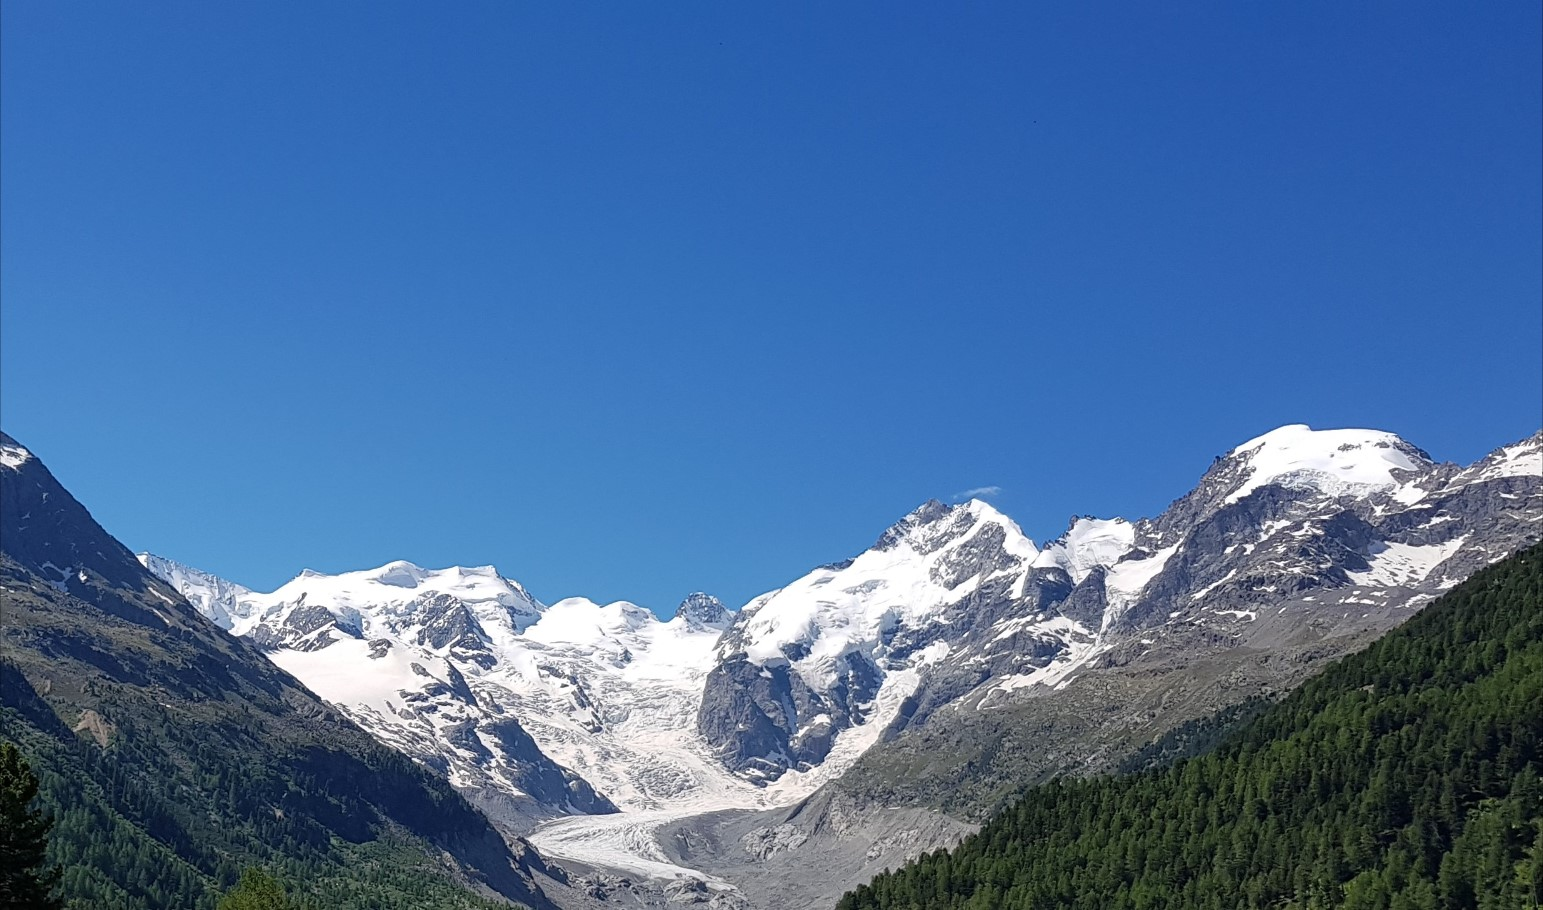 Engadine, Pontresina, Morteratsch, view on Glacier, Bellavista, Piz Bernina